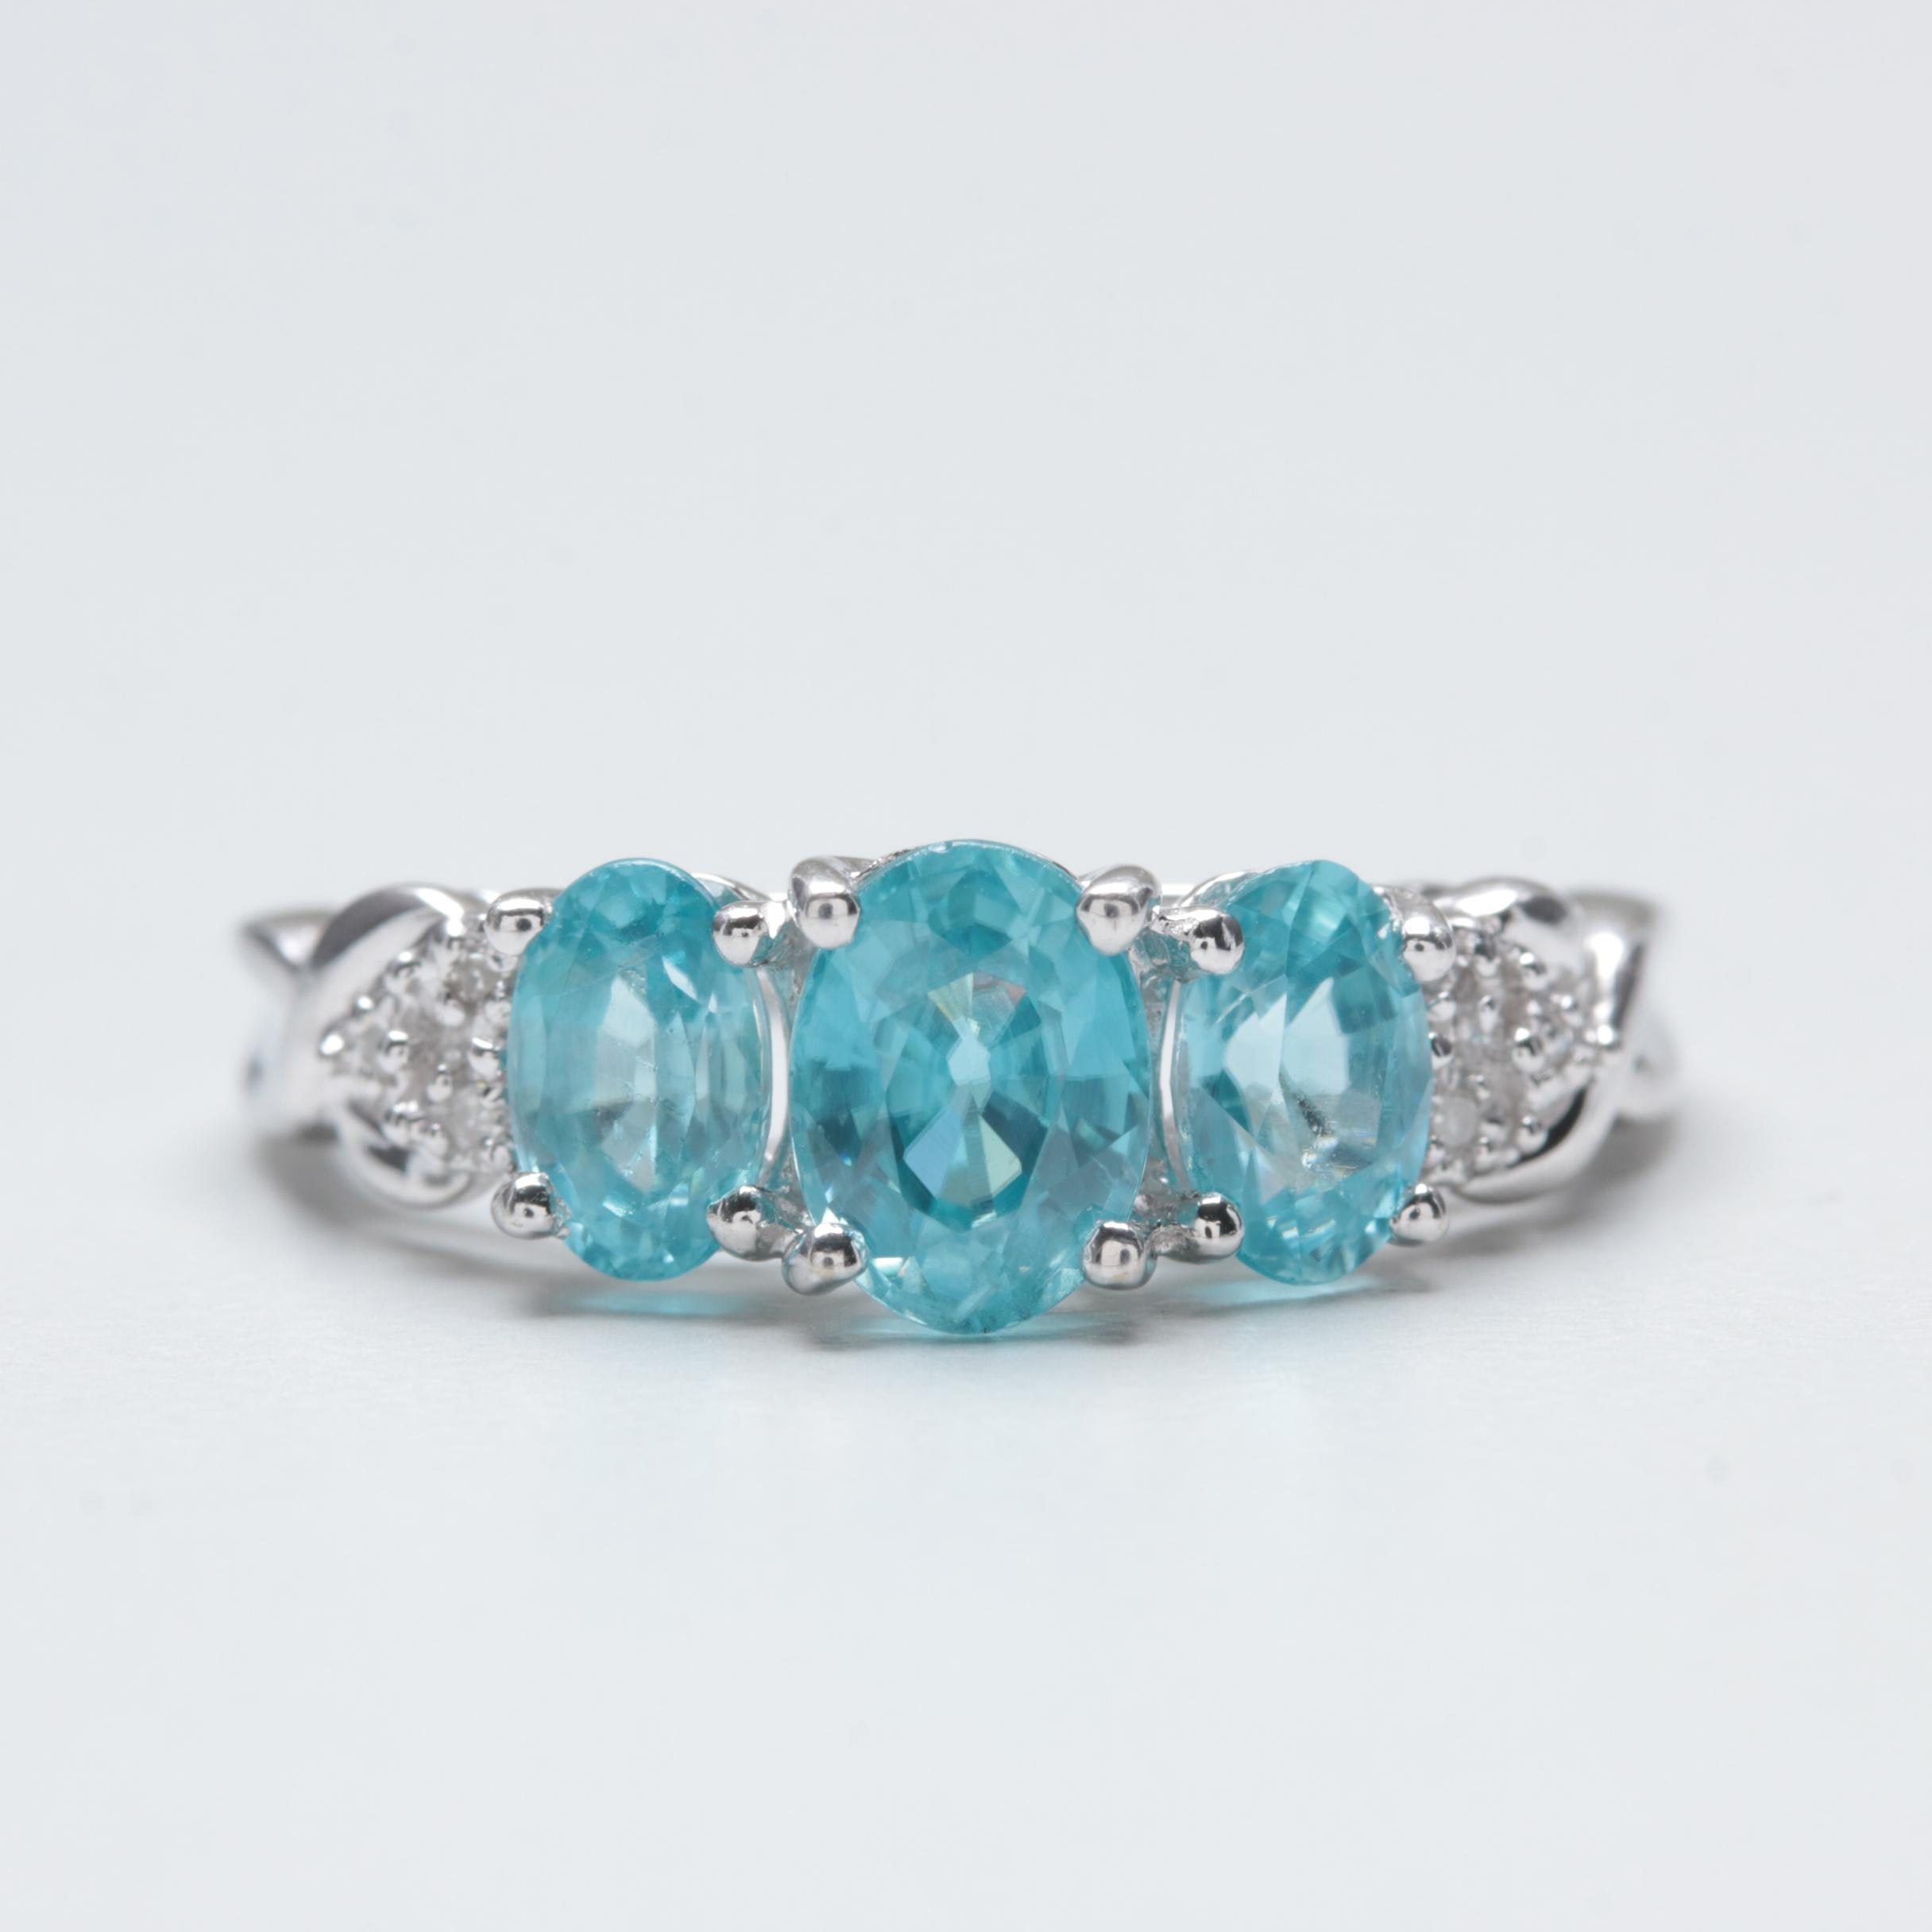 10K White Gold Zircon and Diamond Ring